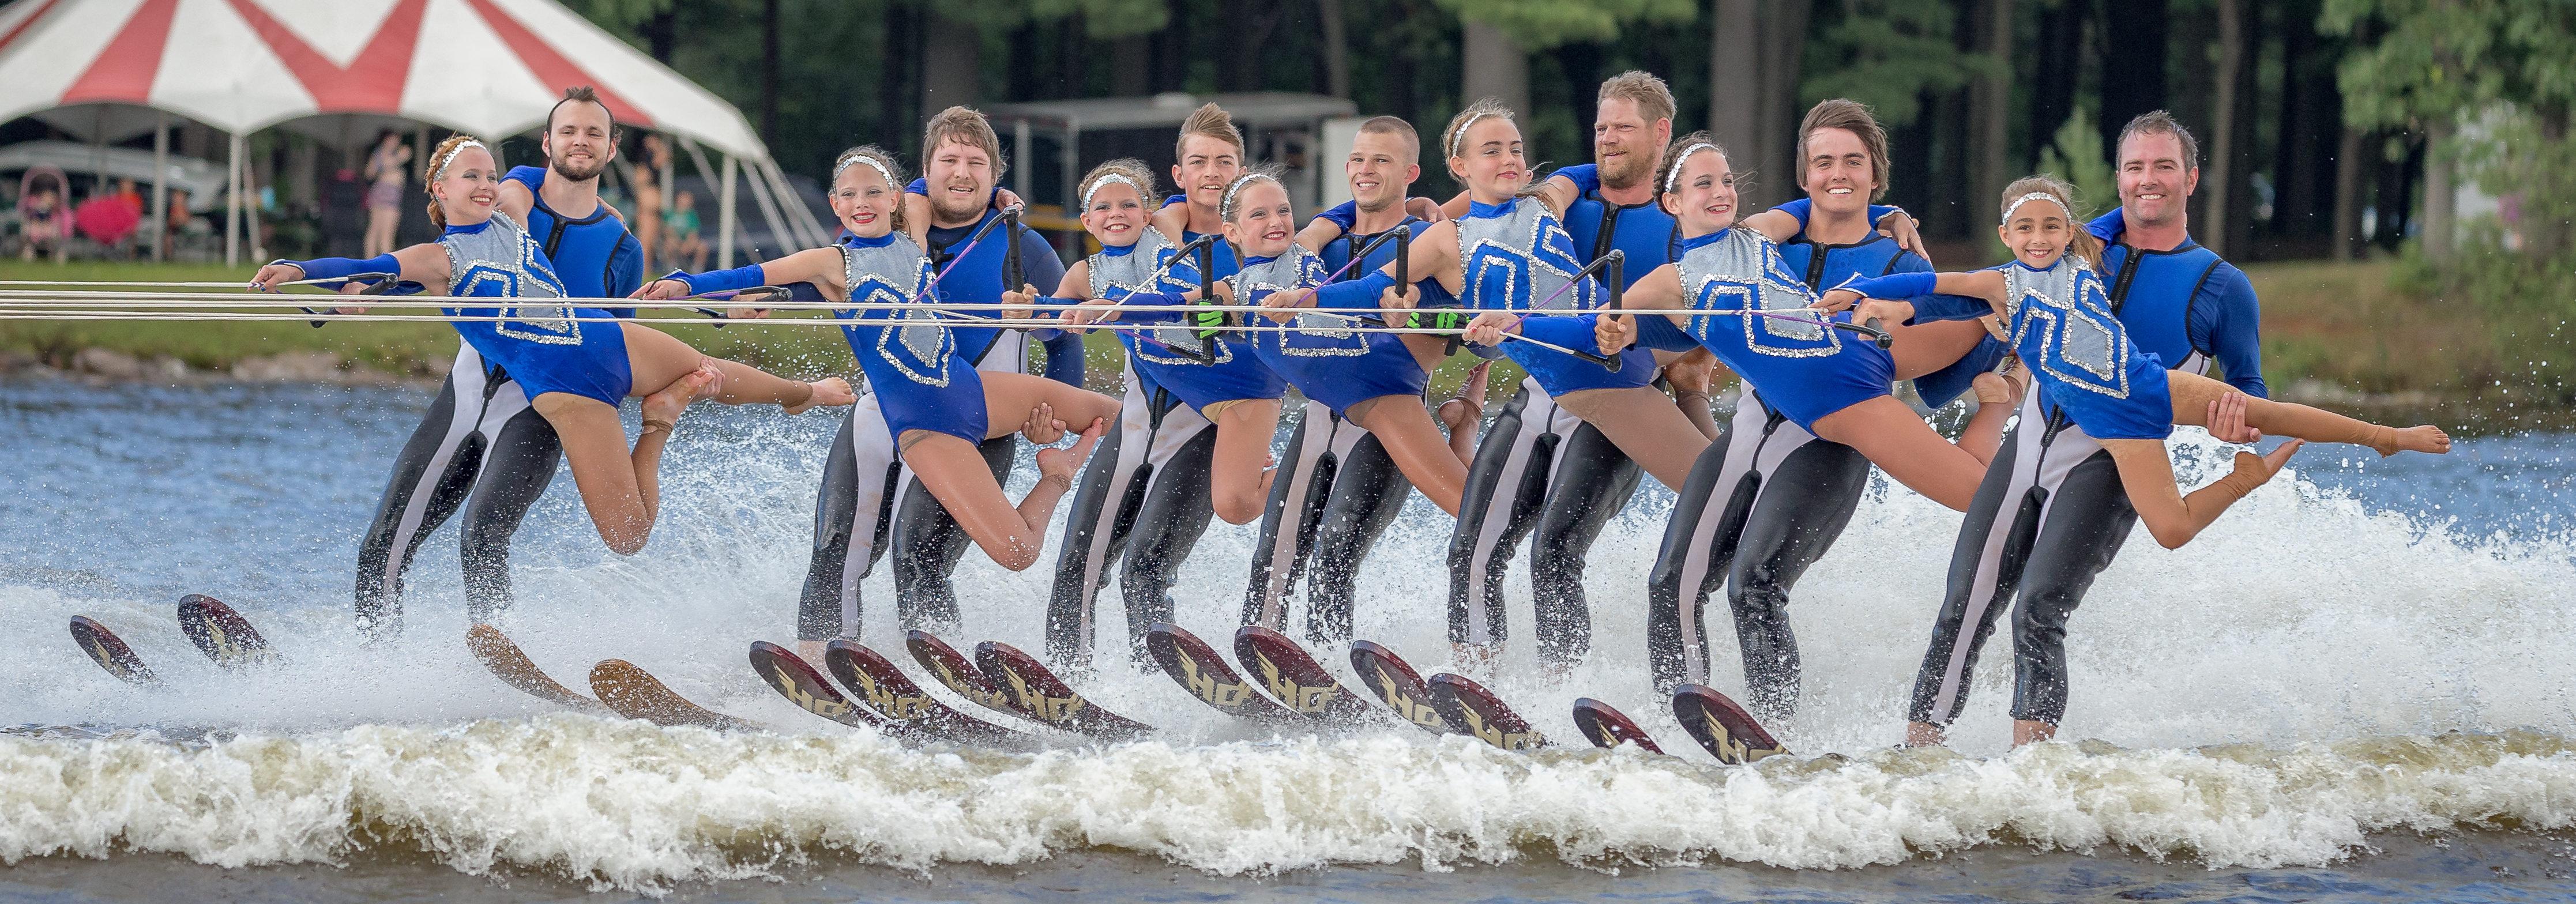 aqua-skiers-state-championship-2017-247-zf-5764-98956-1-068